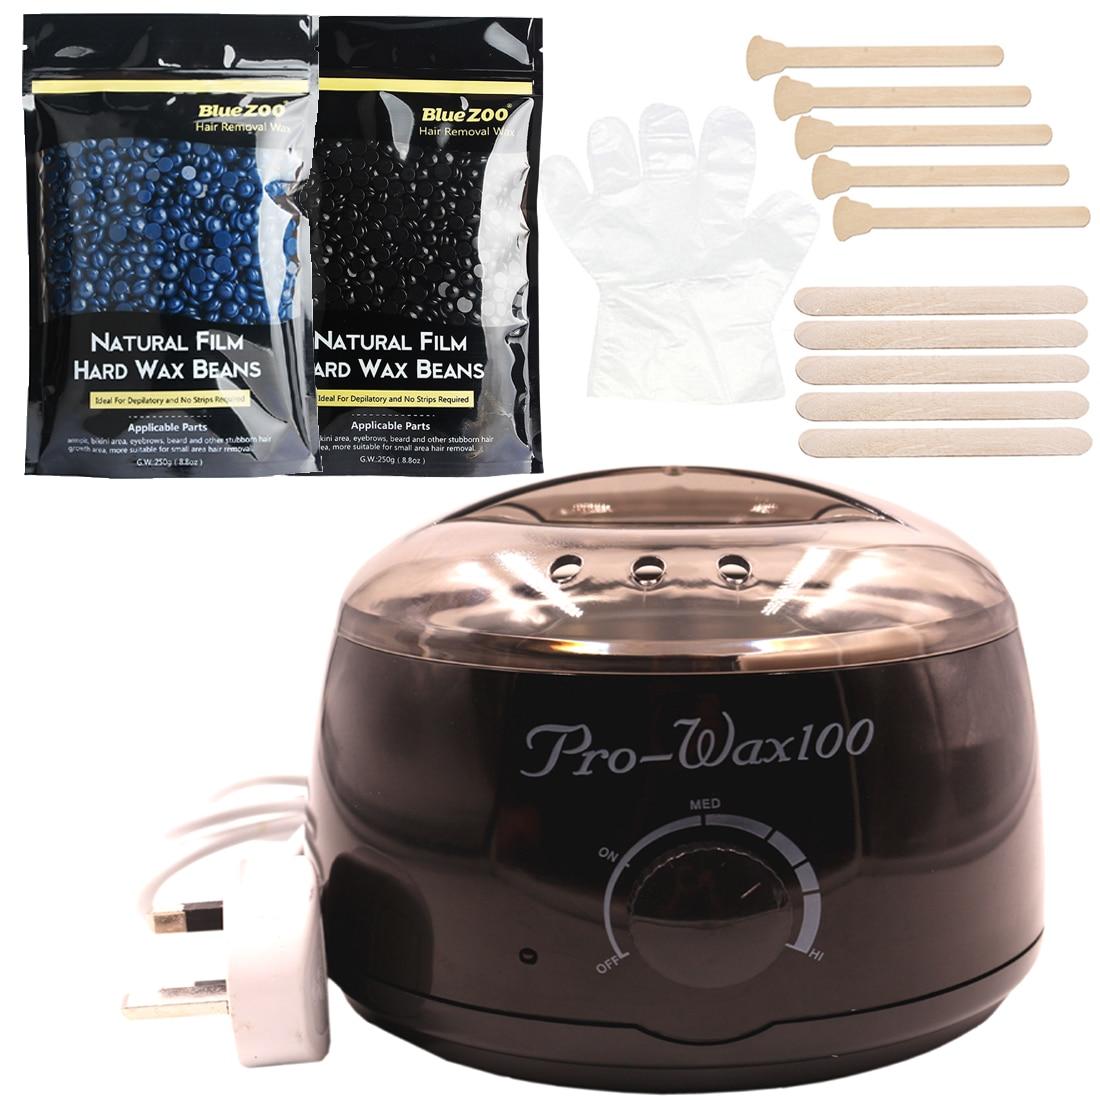 Depilatory Wax Warmer Hard Wax Beans Hair Removal Black Wax Machine